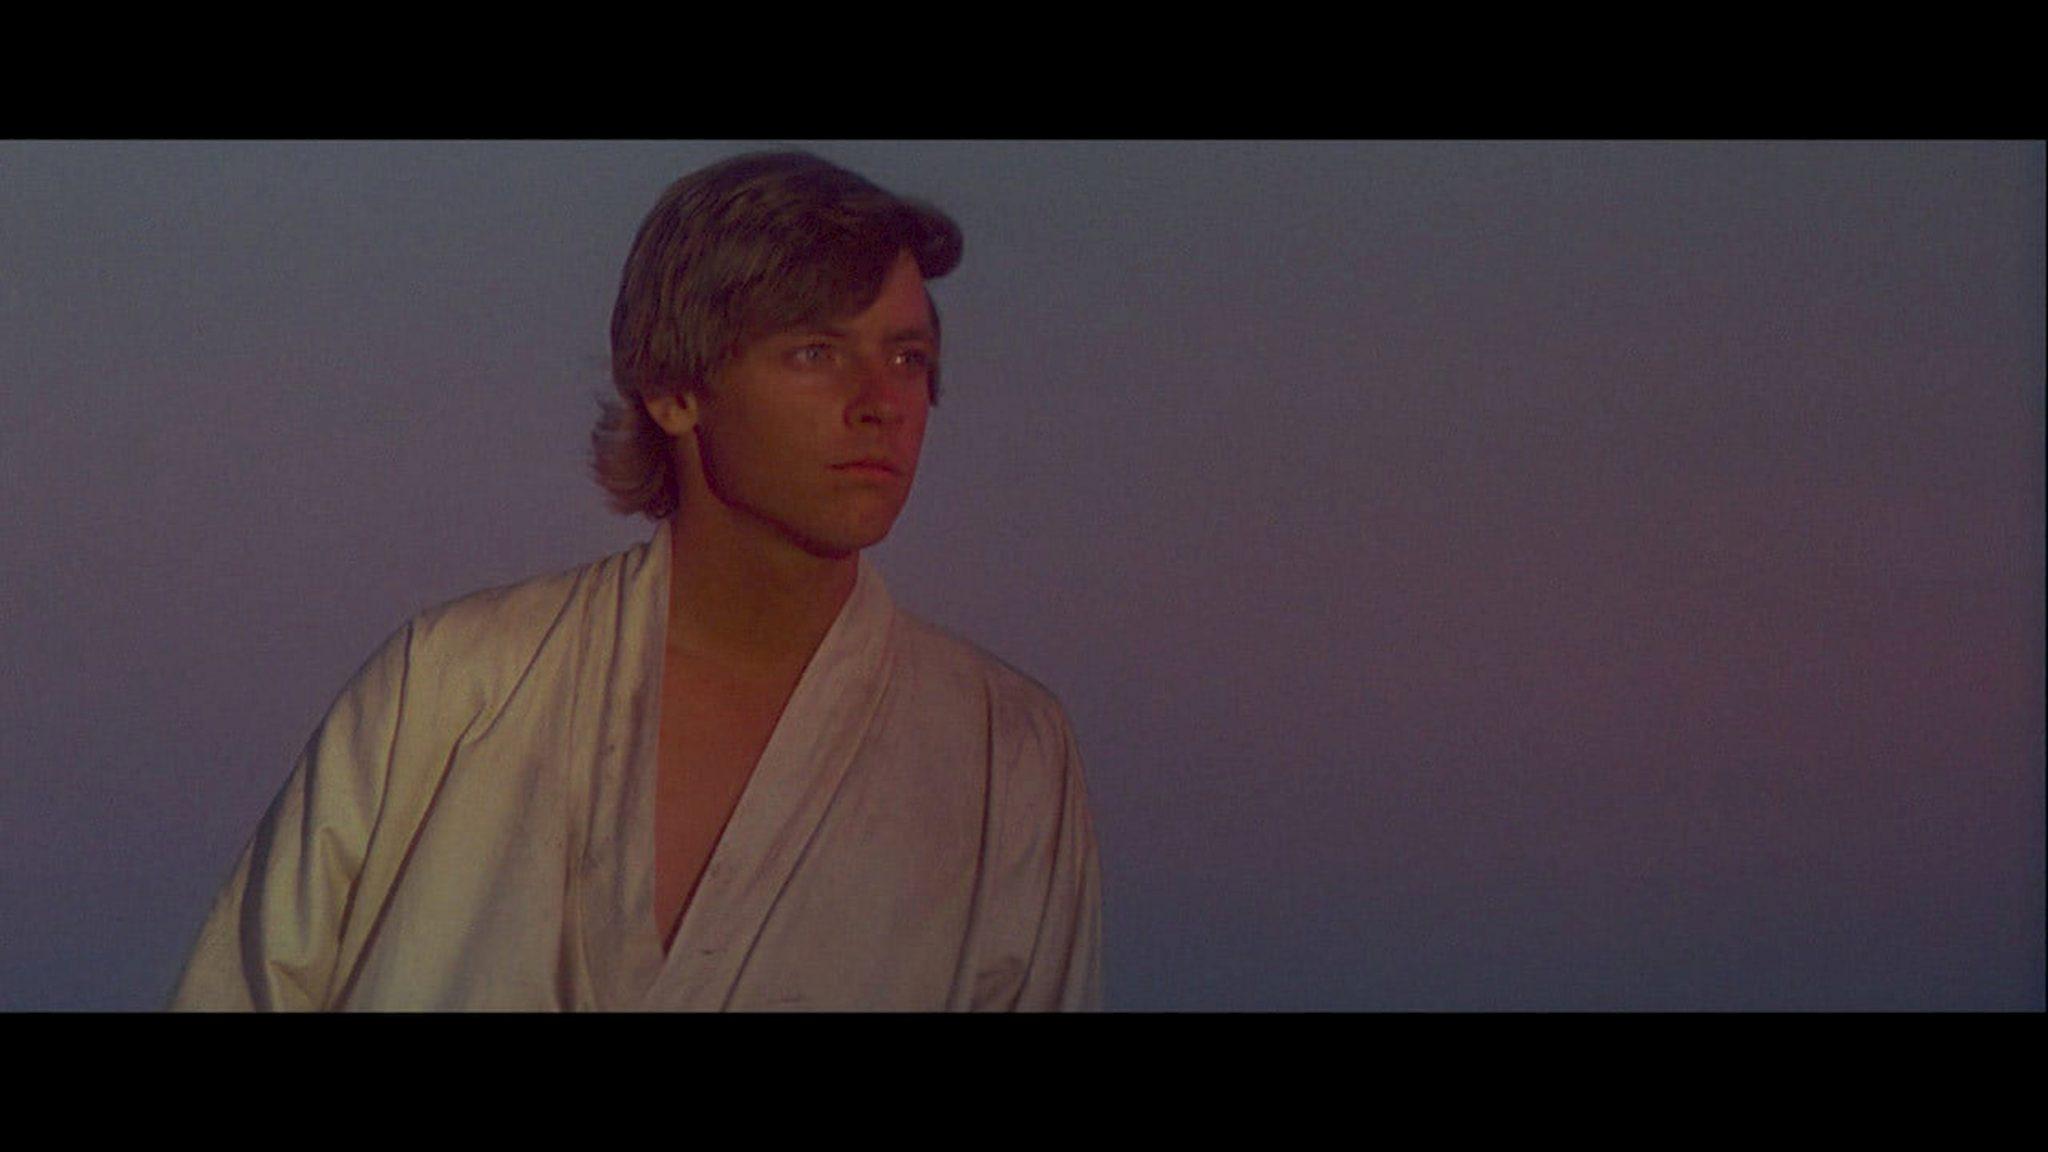 Una convention virtuale in arrivo per lo Star Wars Day thumbnail